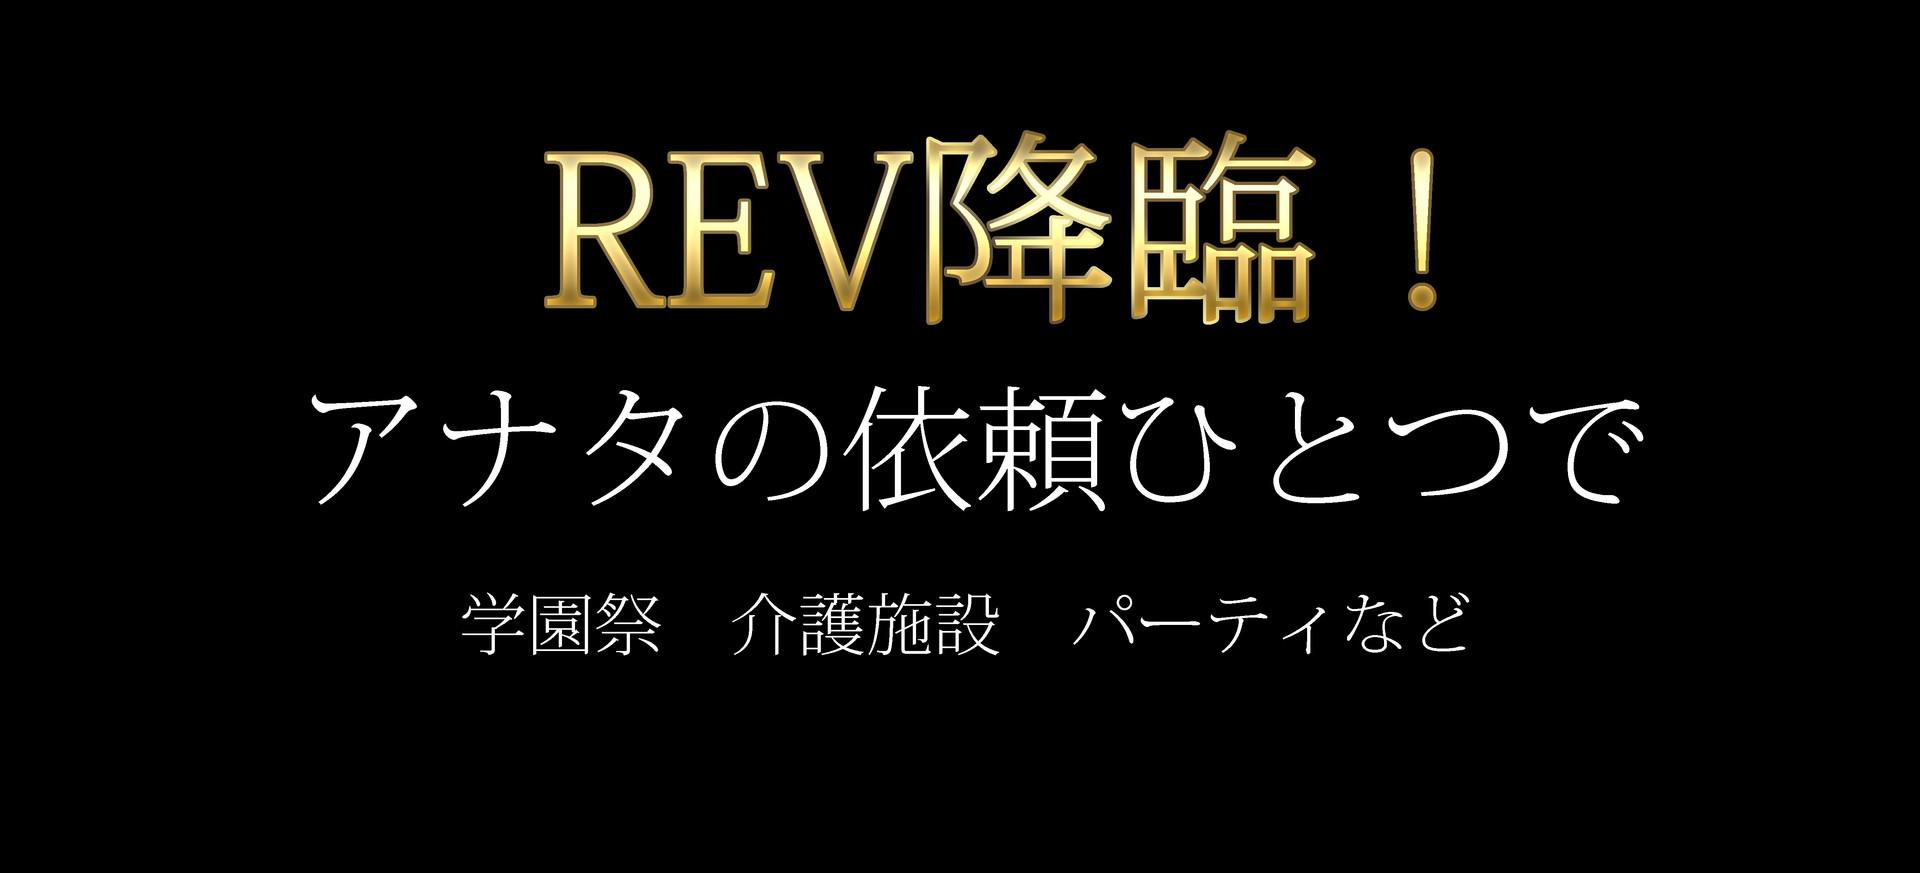 REV降臨01.jpg